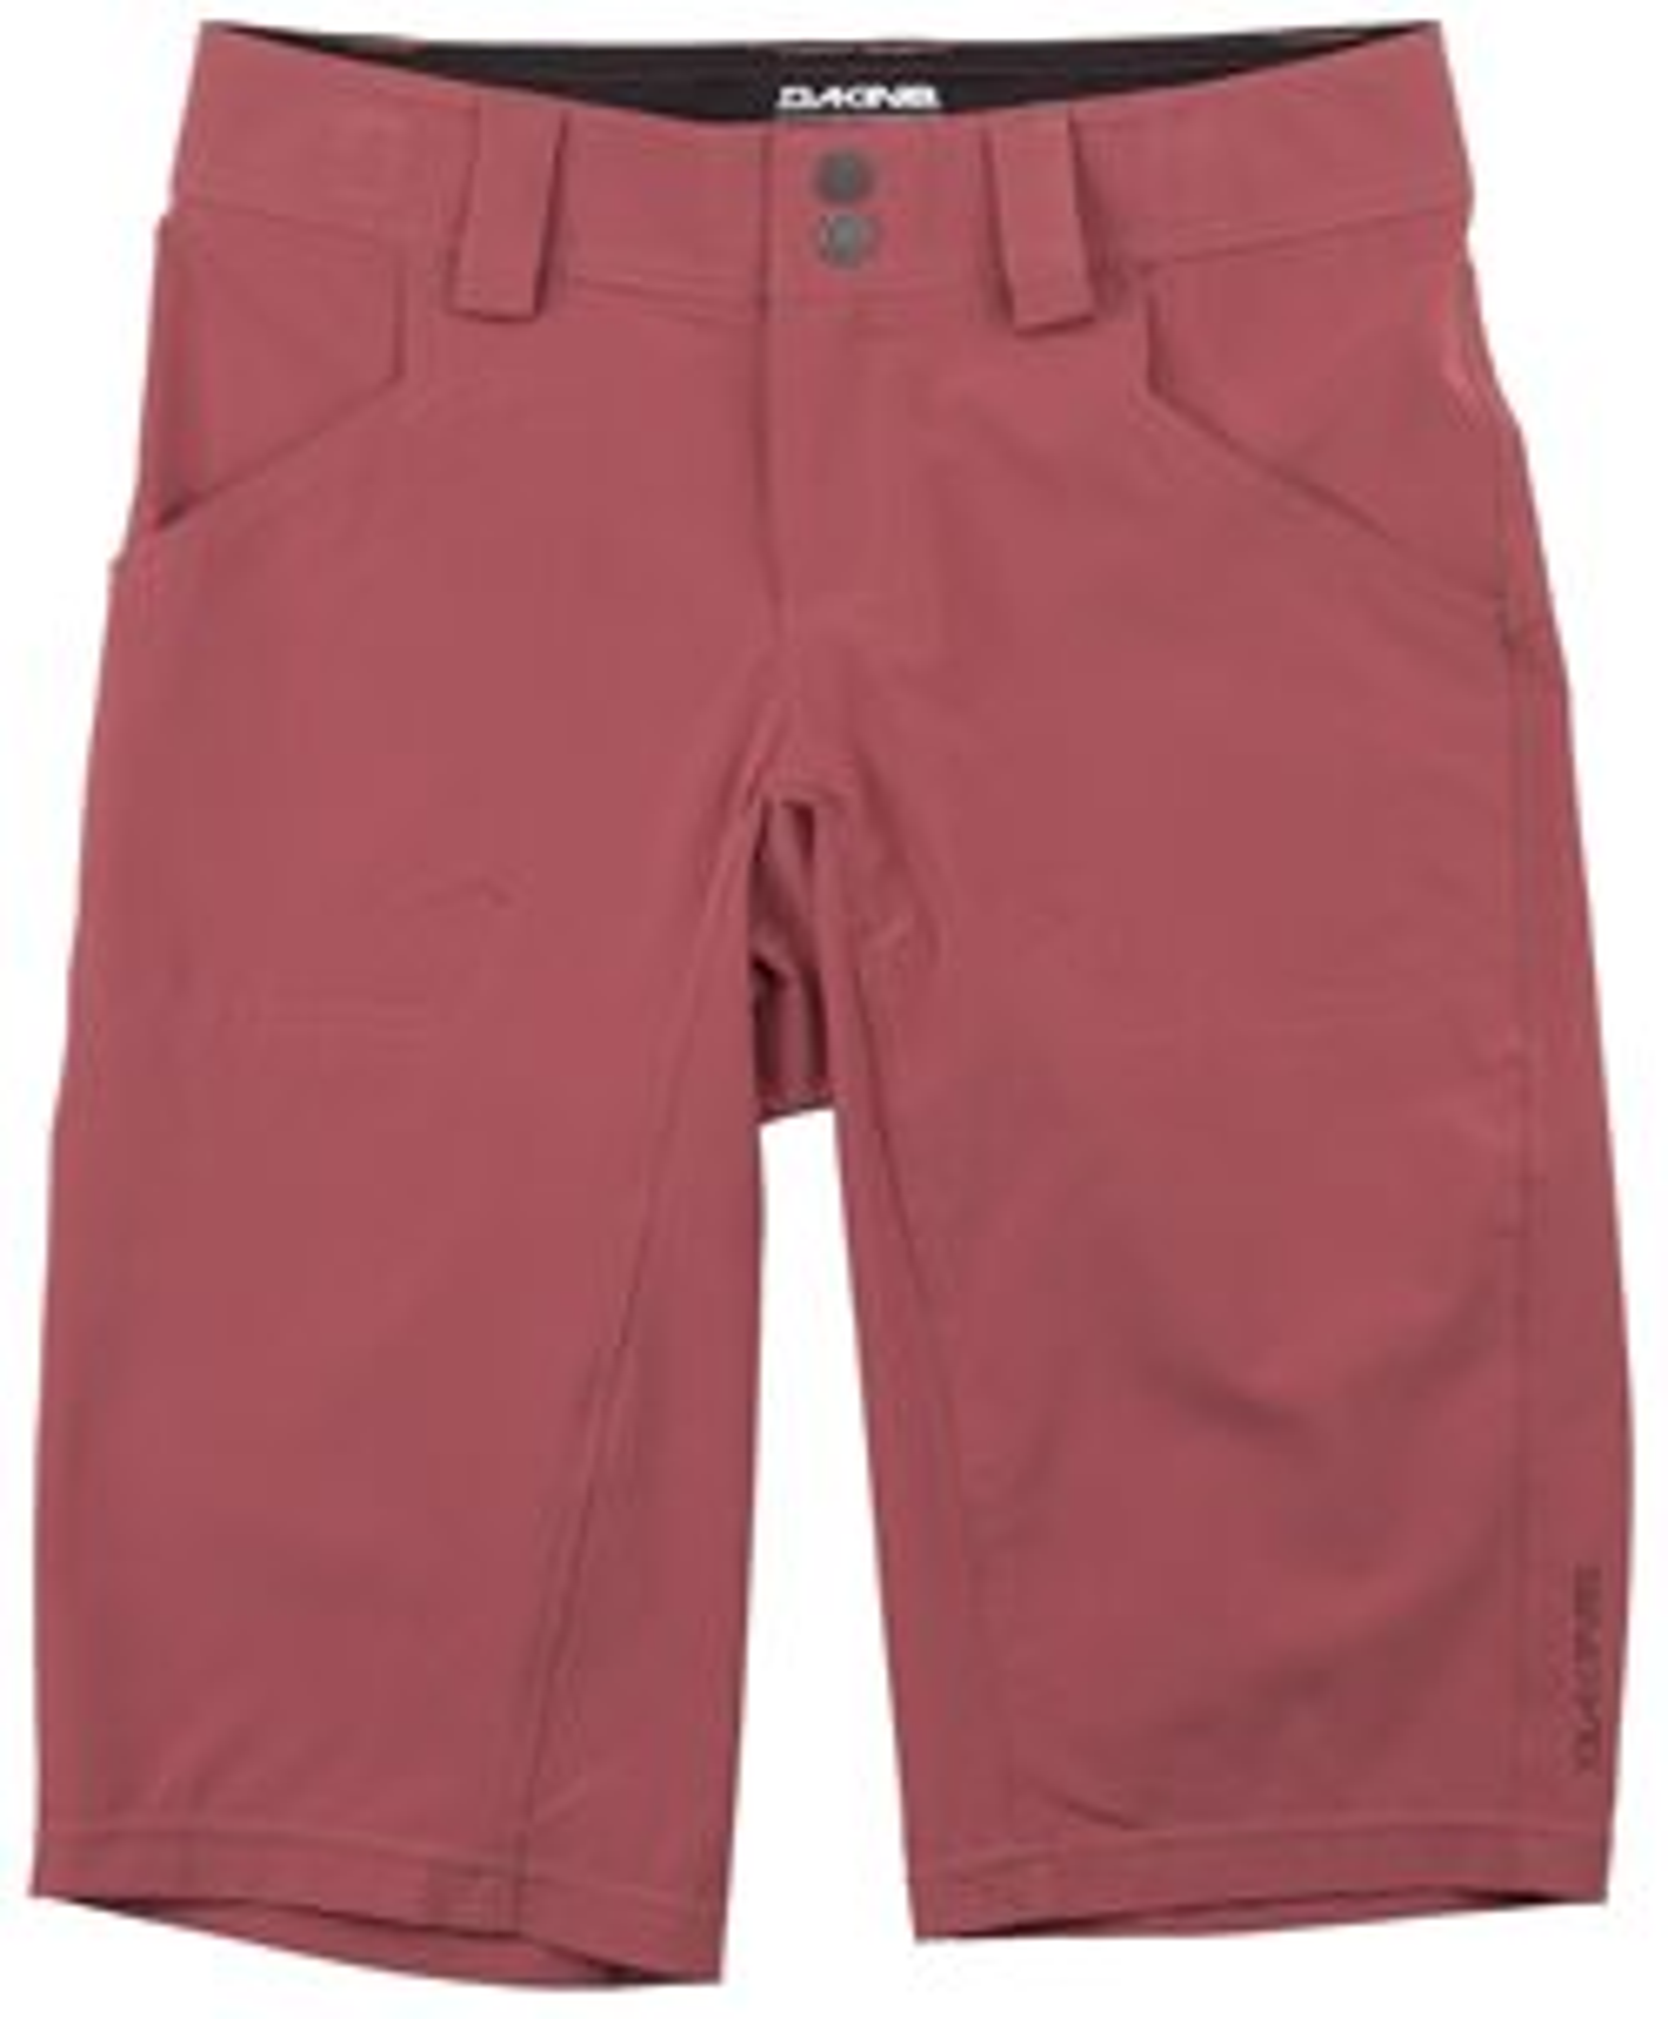 Dakine Cadence MTB Shorts W/0 Liner